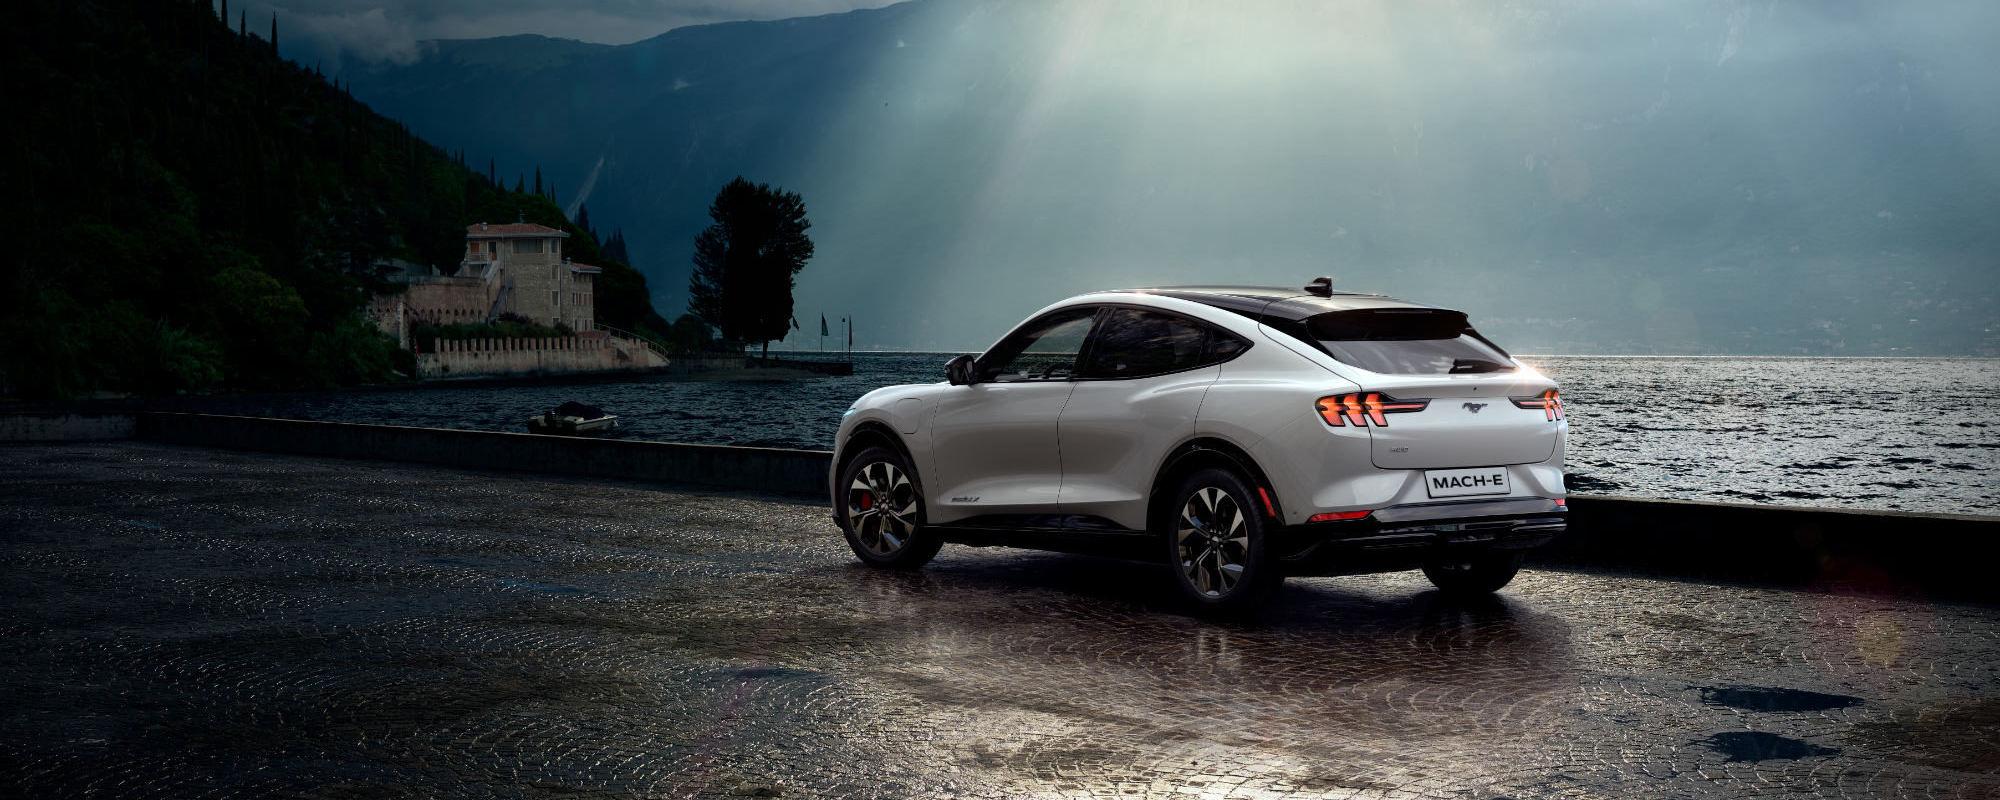 Mustang Mach-E Solberg Bil